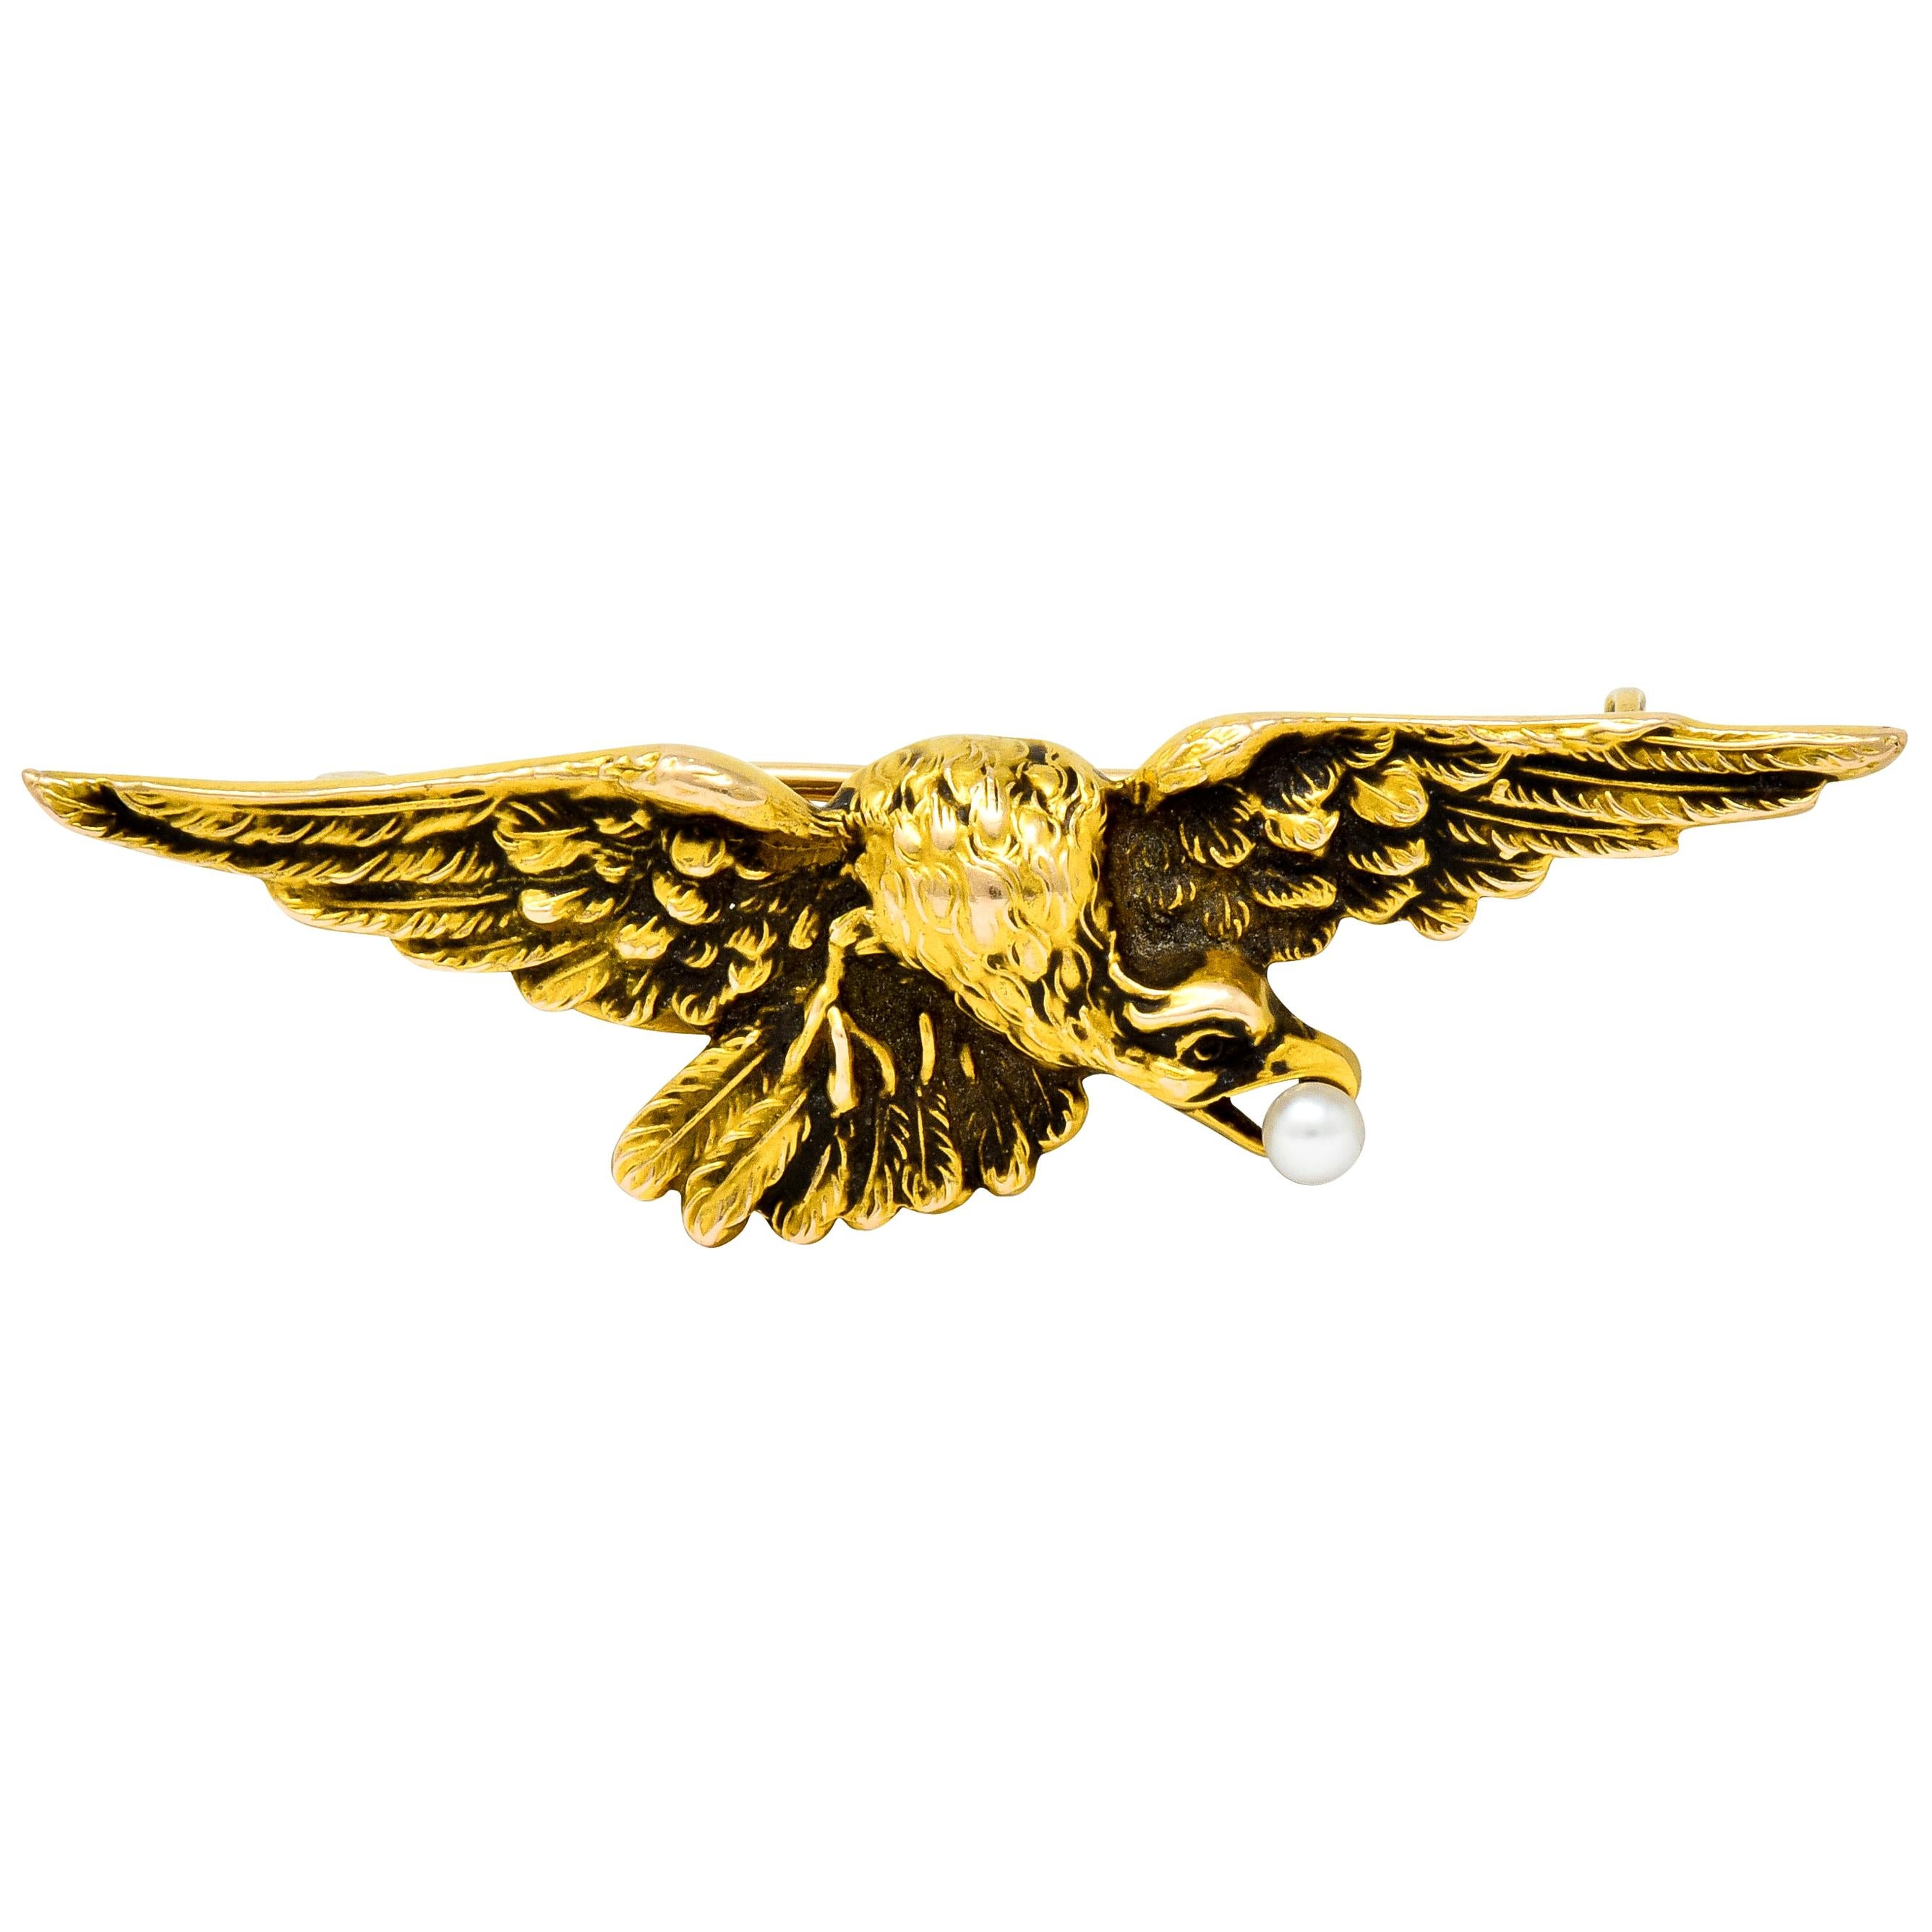 Wordley Allsopp & Bliss Art Nouveau Pearl 14 Karat Gold Eagle Brooch